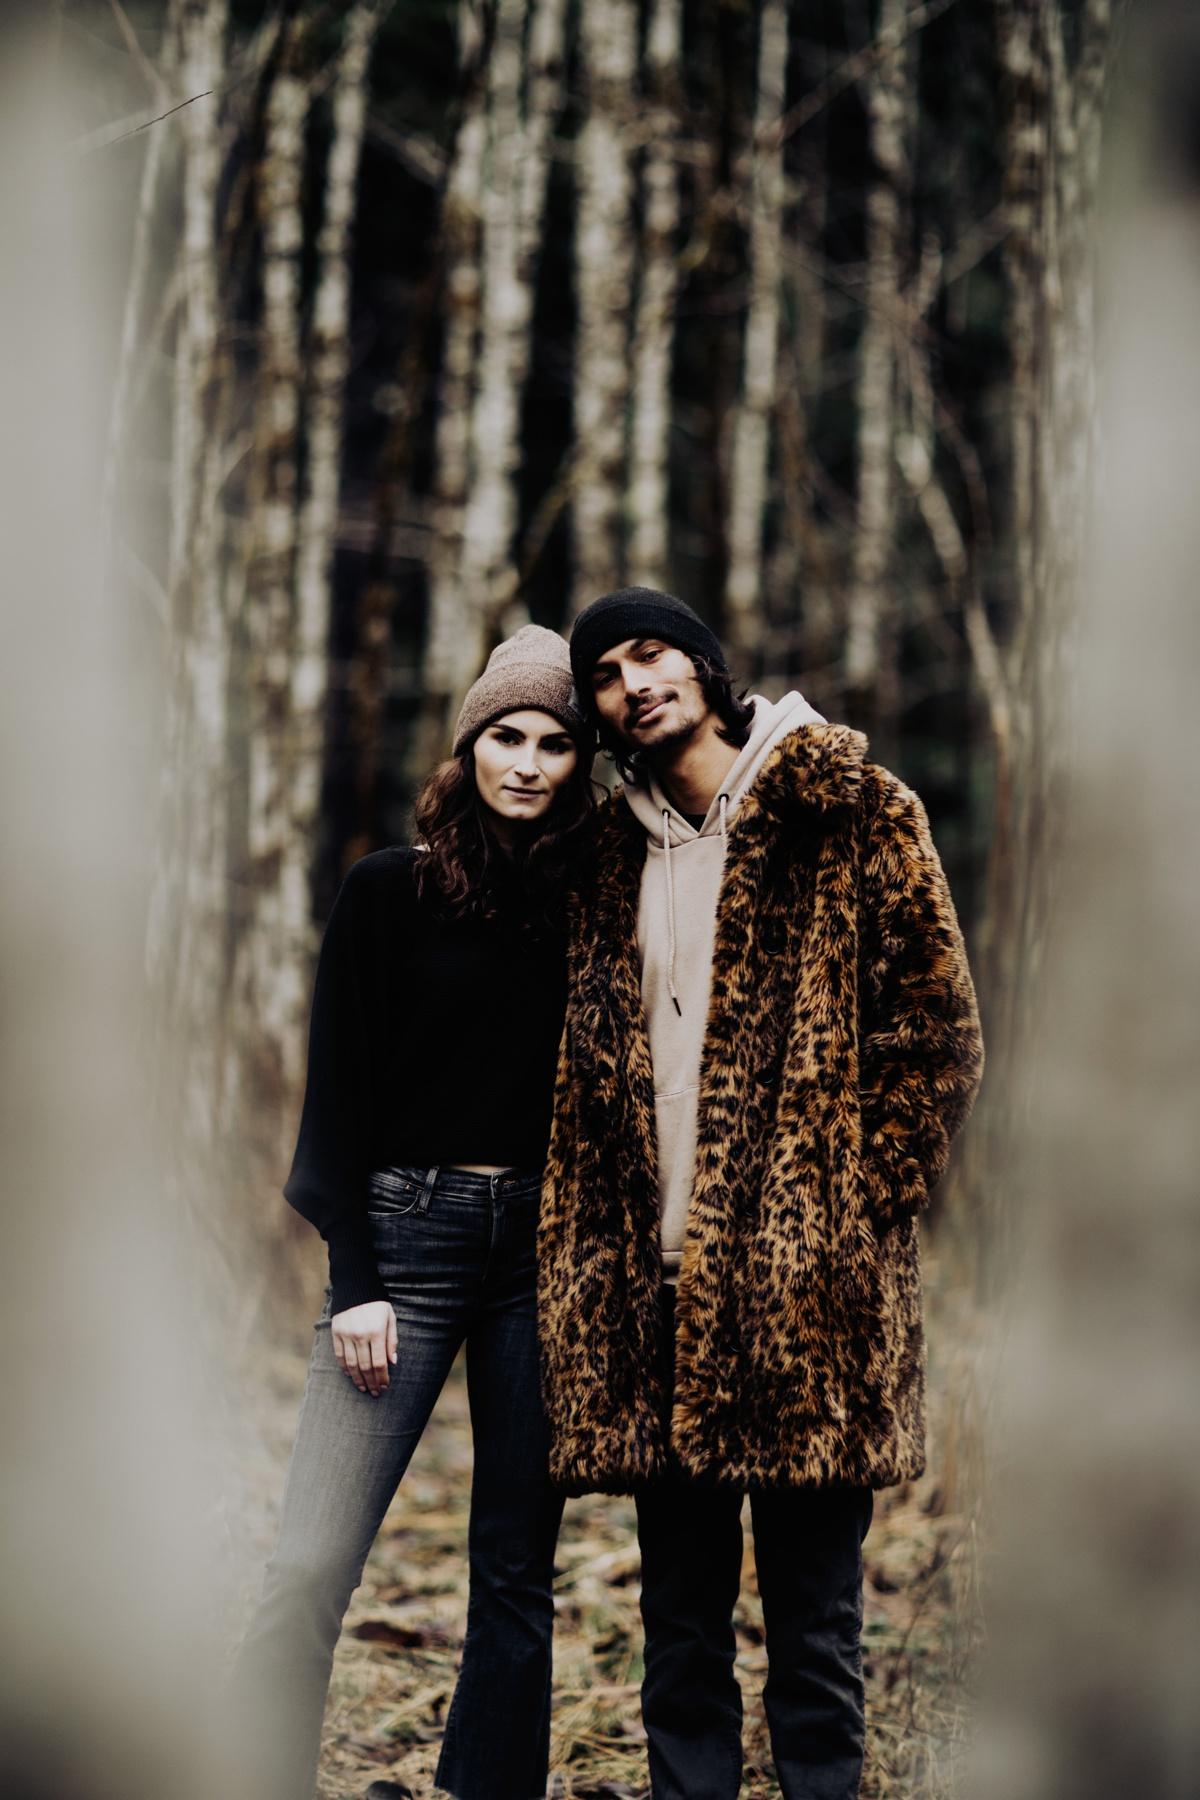 Wenatchee-national-forest-engagement-session-photographer-026.jpg